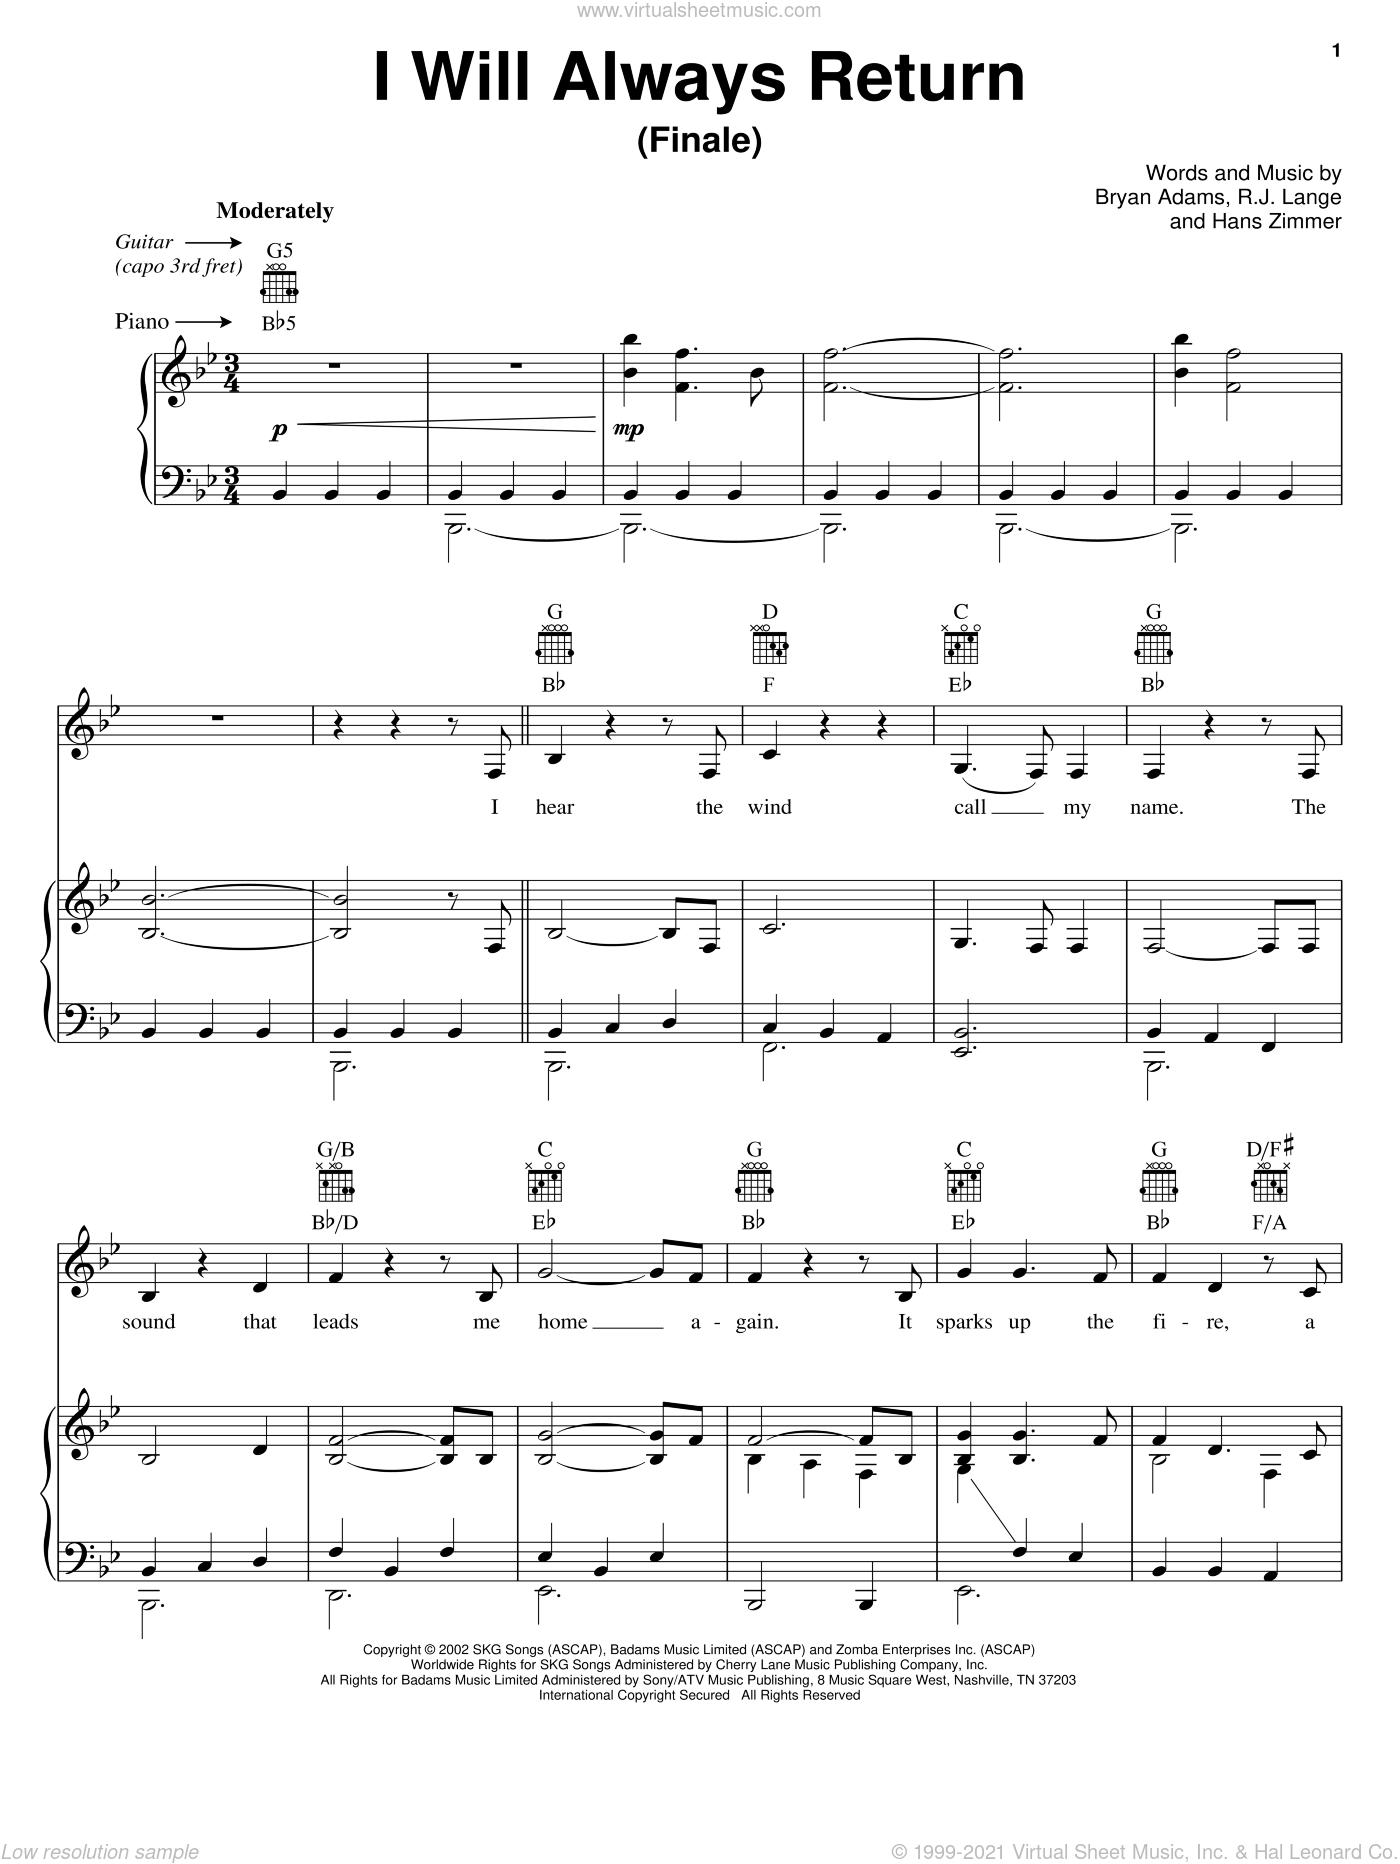 I Will Always Return (Finale) sheet music for voice, piano or guitar by Bryan Adams, Spirit: Stallion Of The Cimarron (Movie), Hans Zimmer and Robert John Lange, intermediate skill level